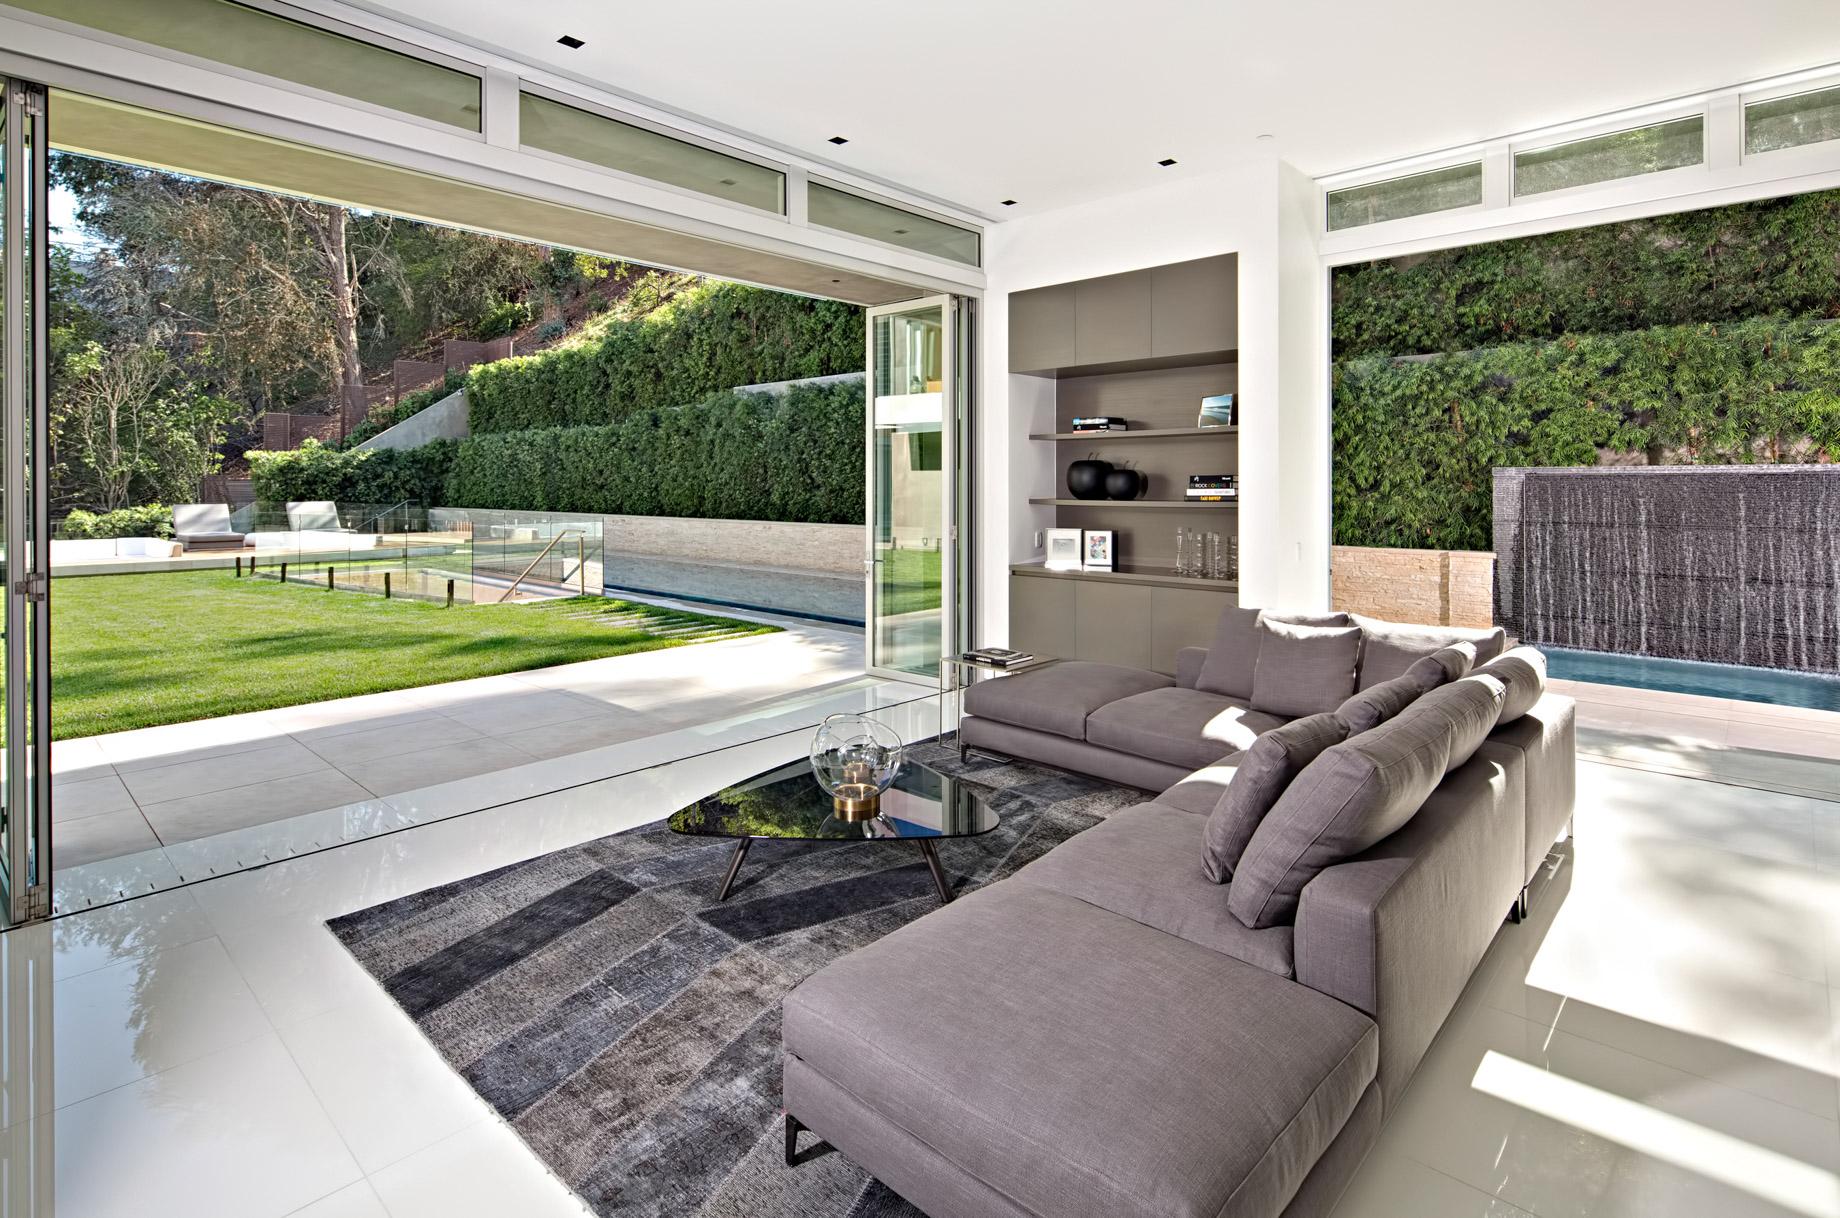 Sunset Strip Modern - 1307 Sierra Alta Way, Los Angeles, CA, USA